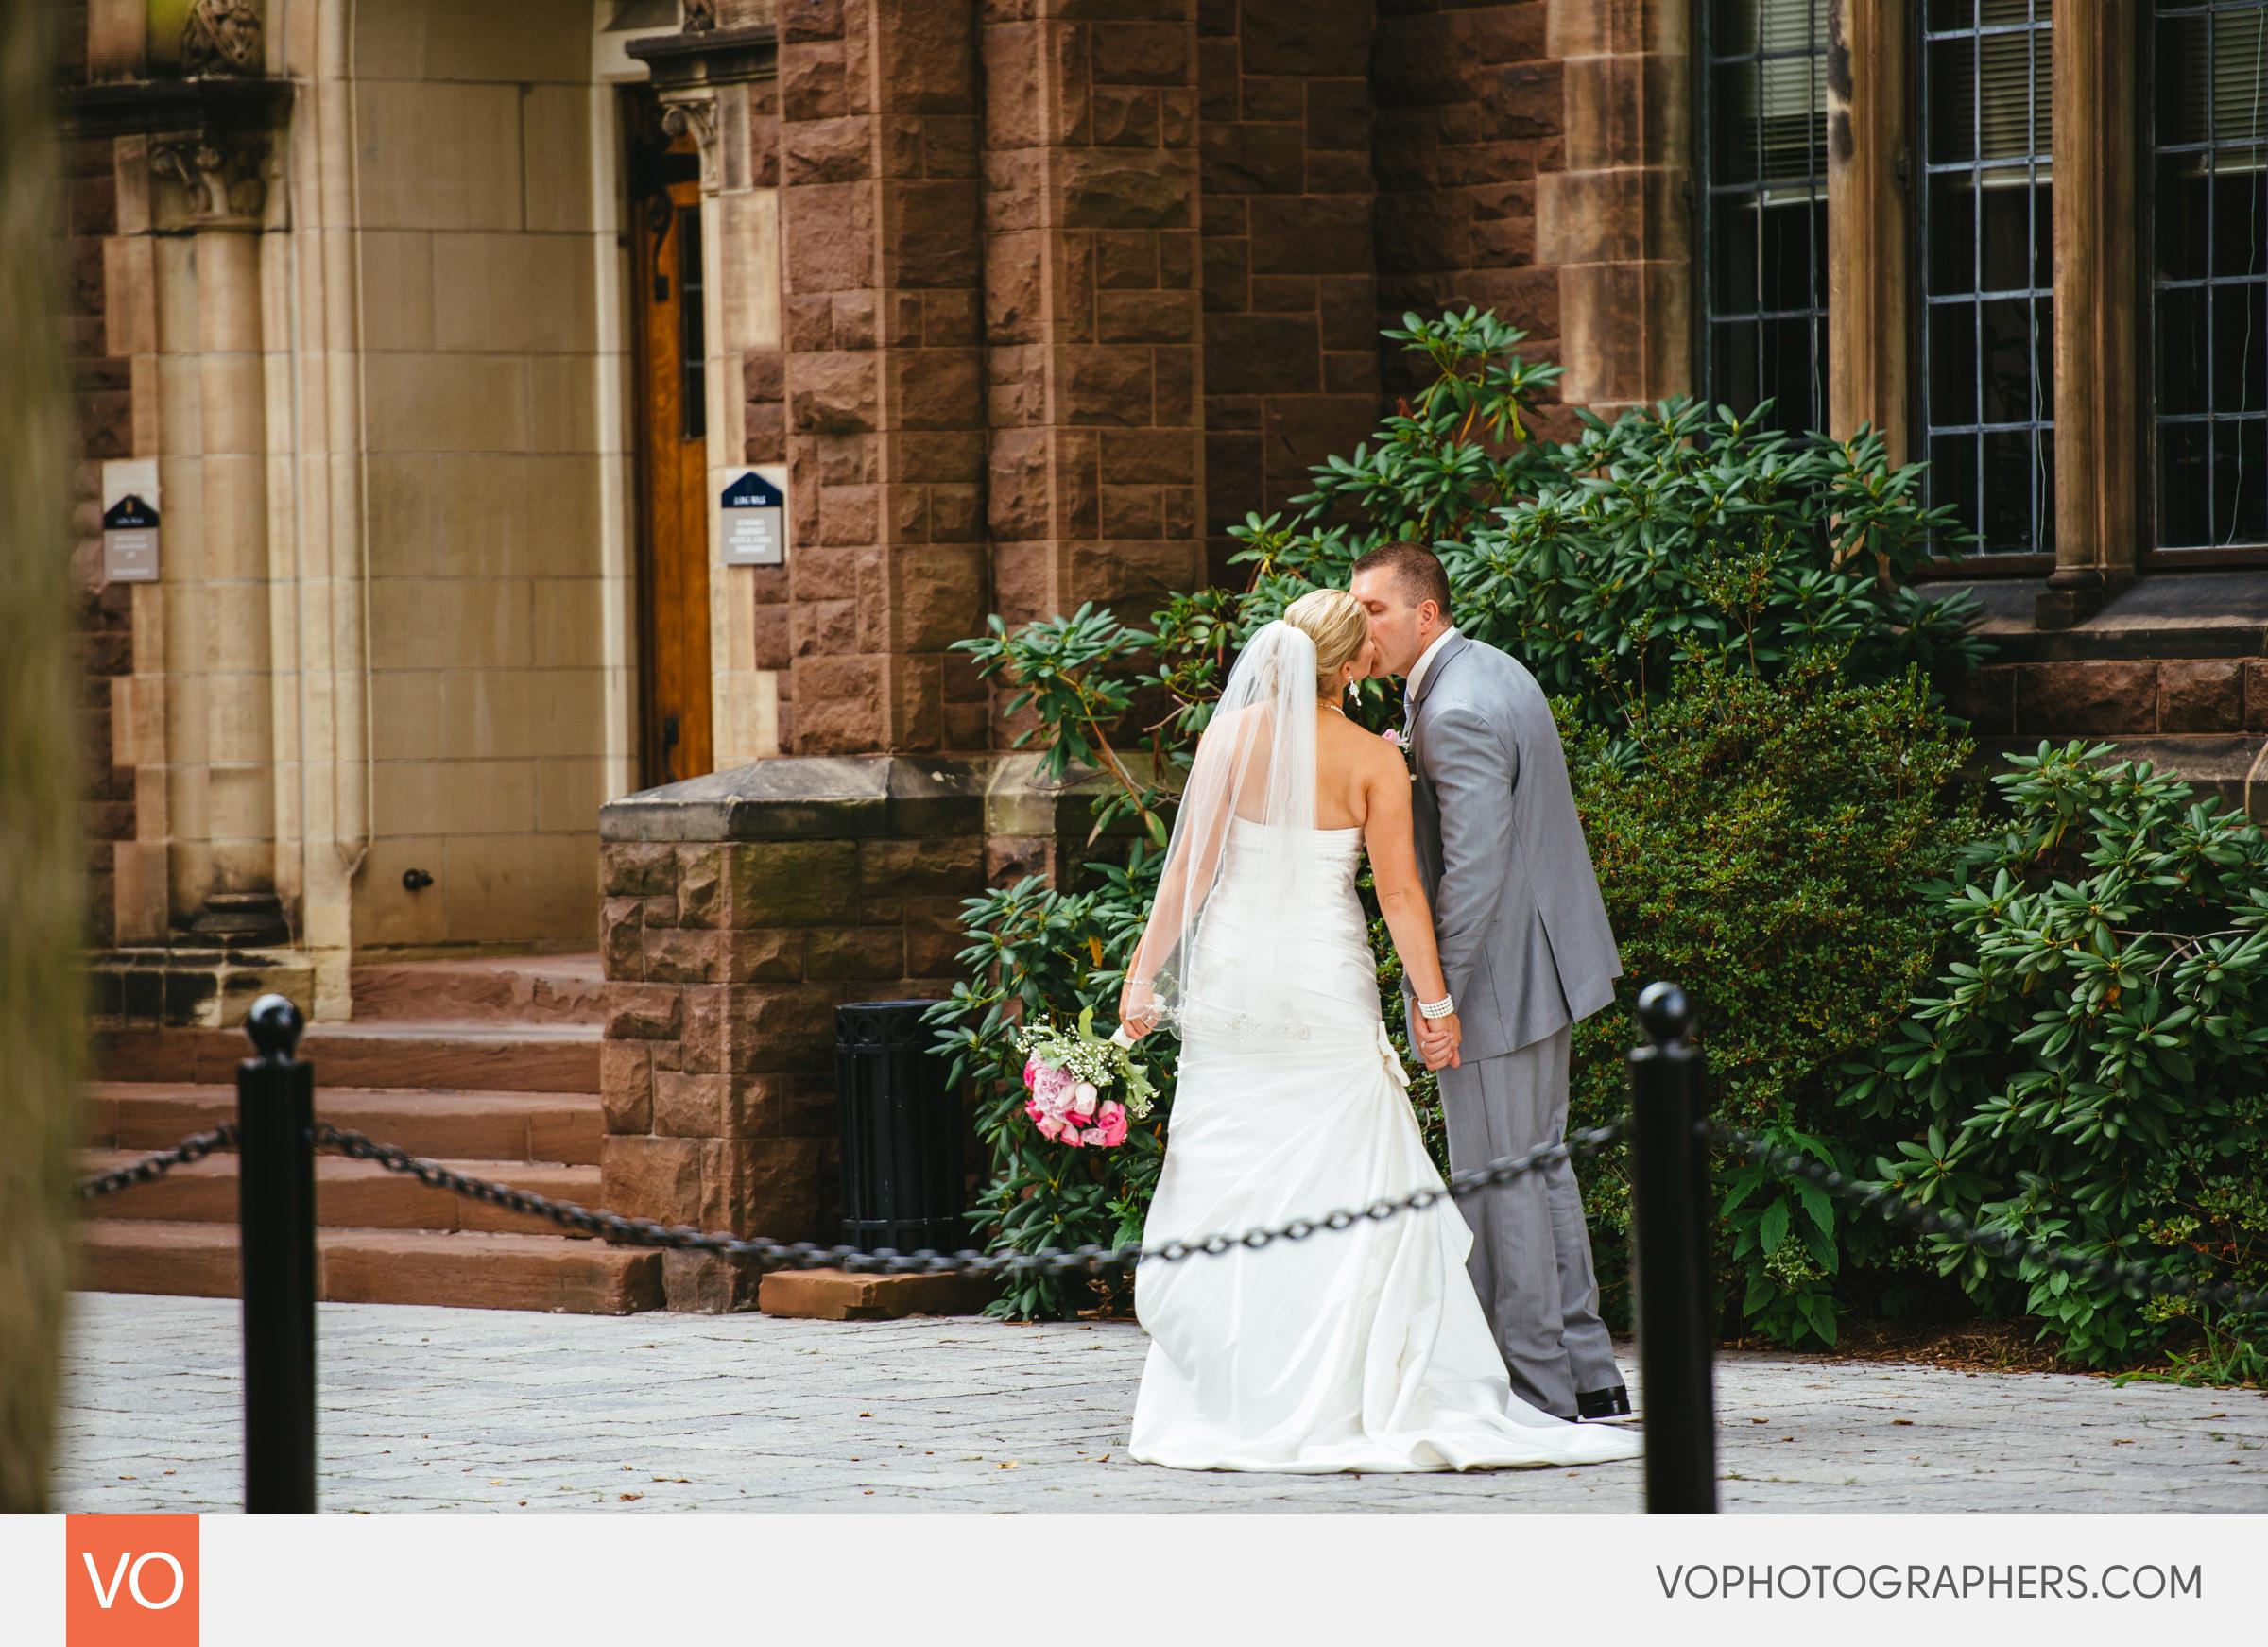 Doubletree-Hotel-Bristol-Wedding-Cathy-Chris-0022